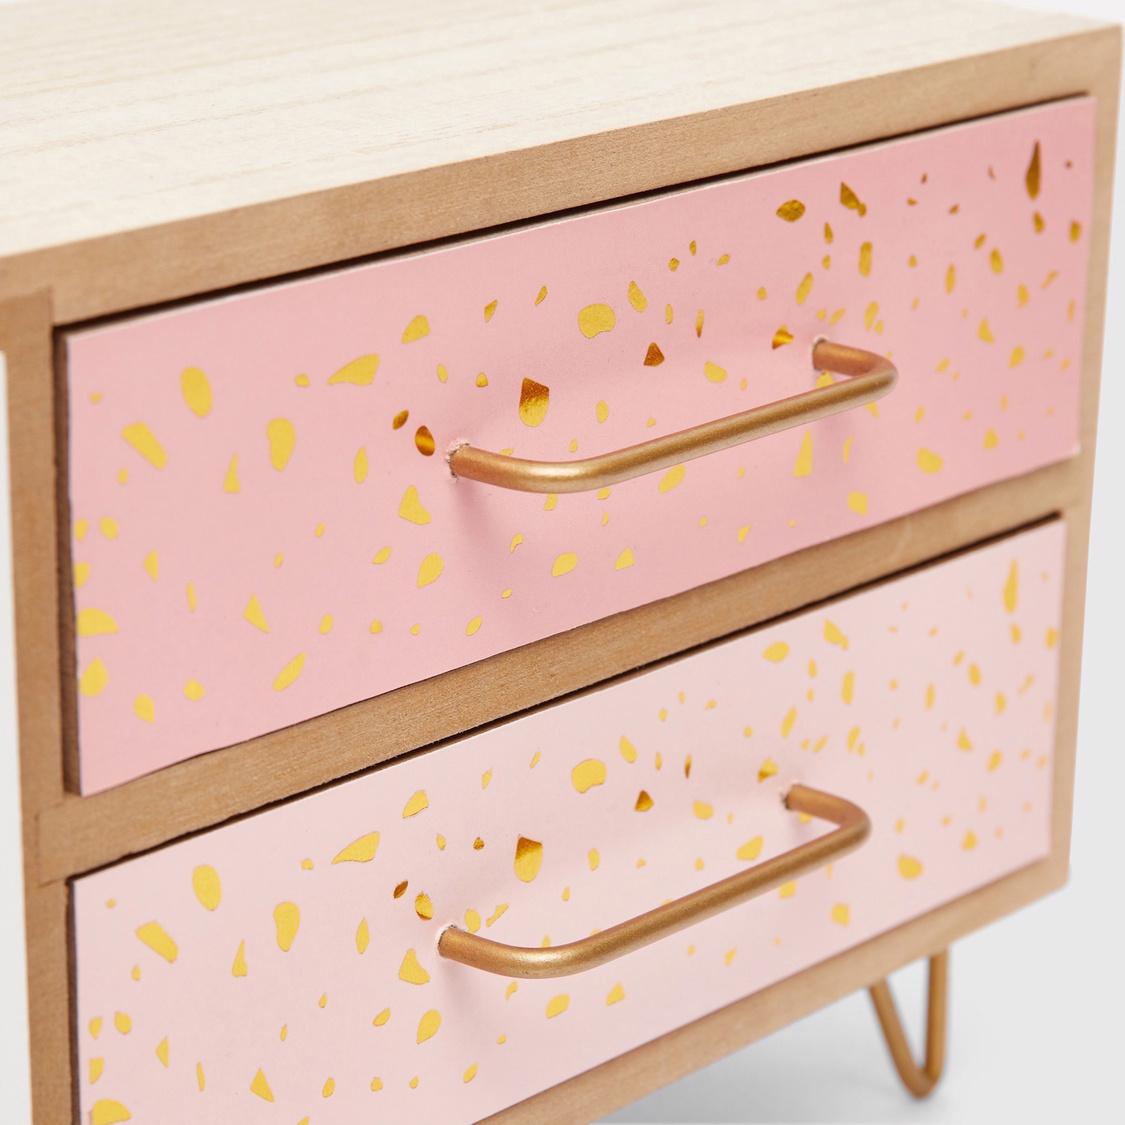 Wooden Decorative Table Top Jewellery Organiser